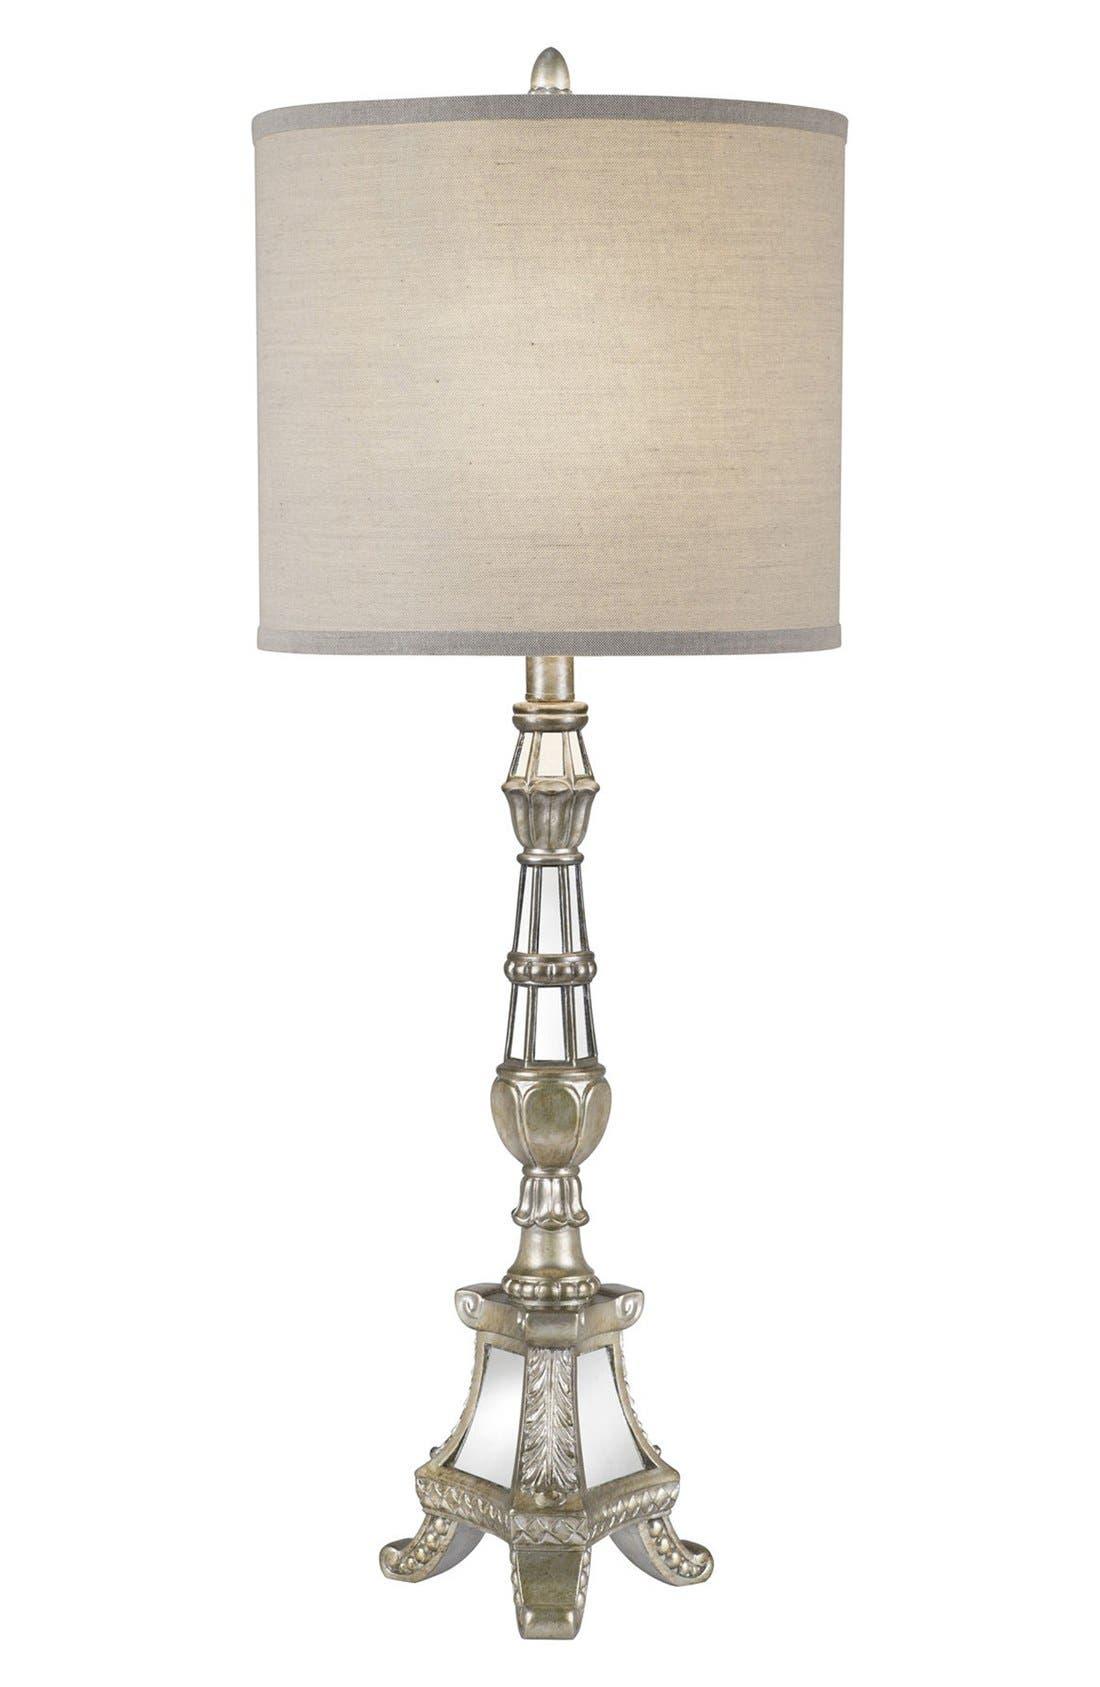 Main Image - JAlexander Mirrored Metallic Table Lamp